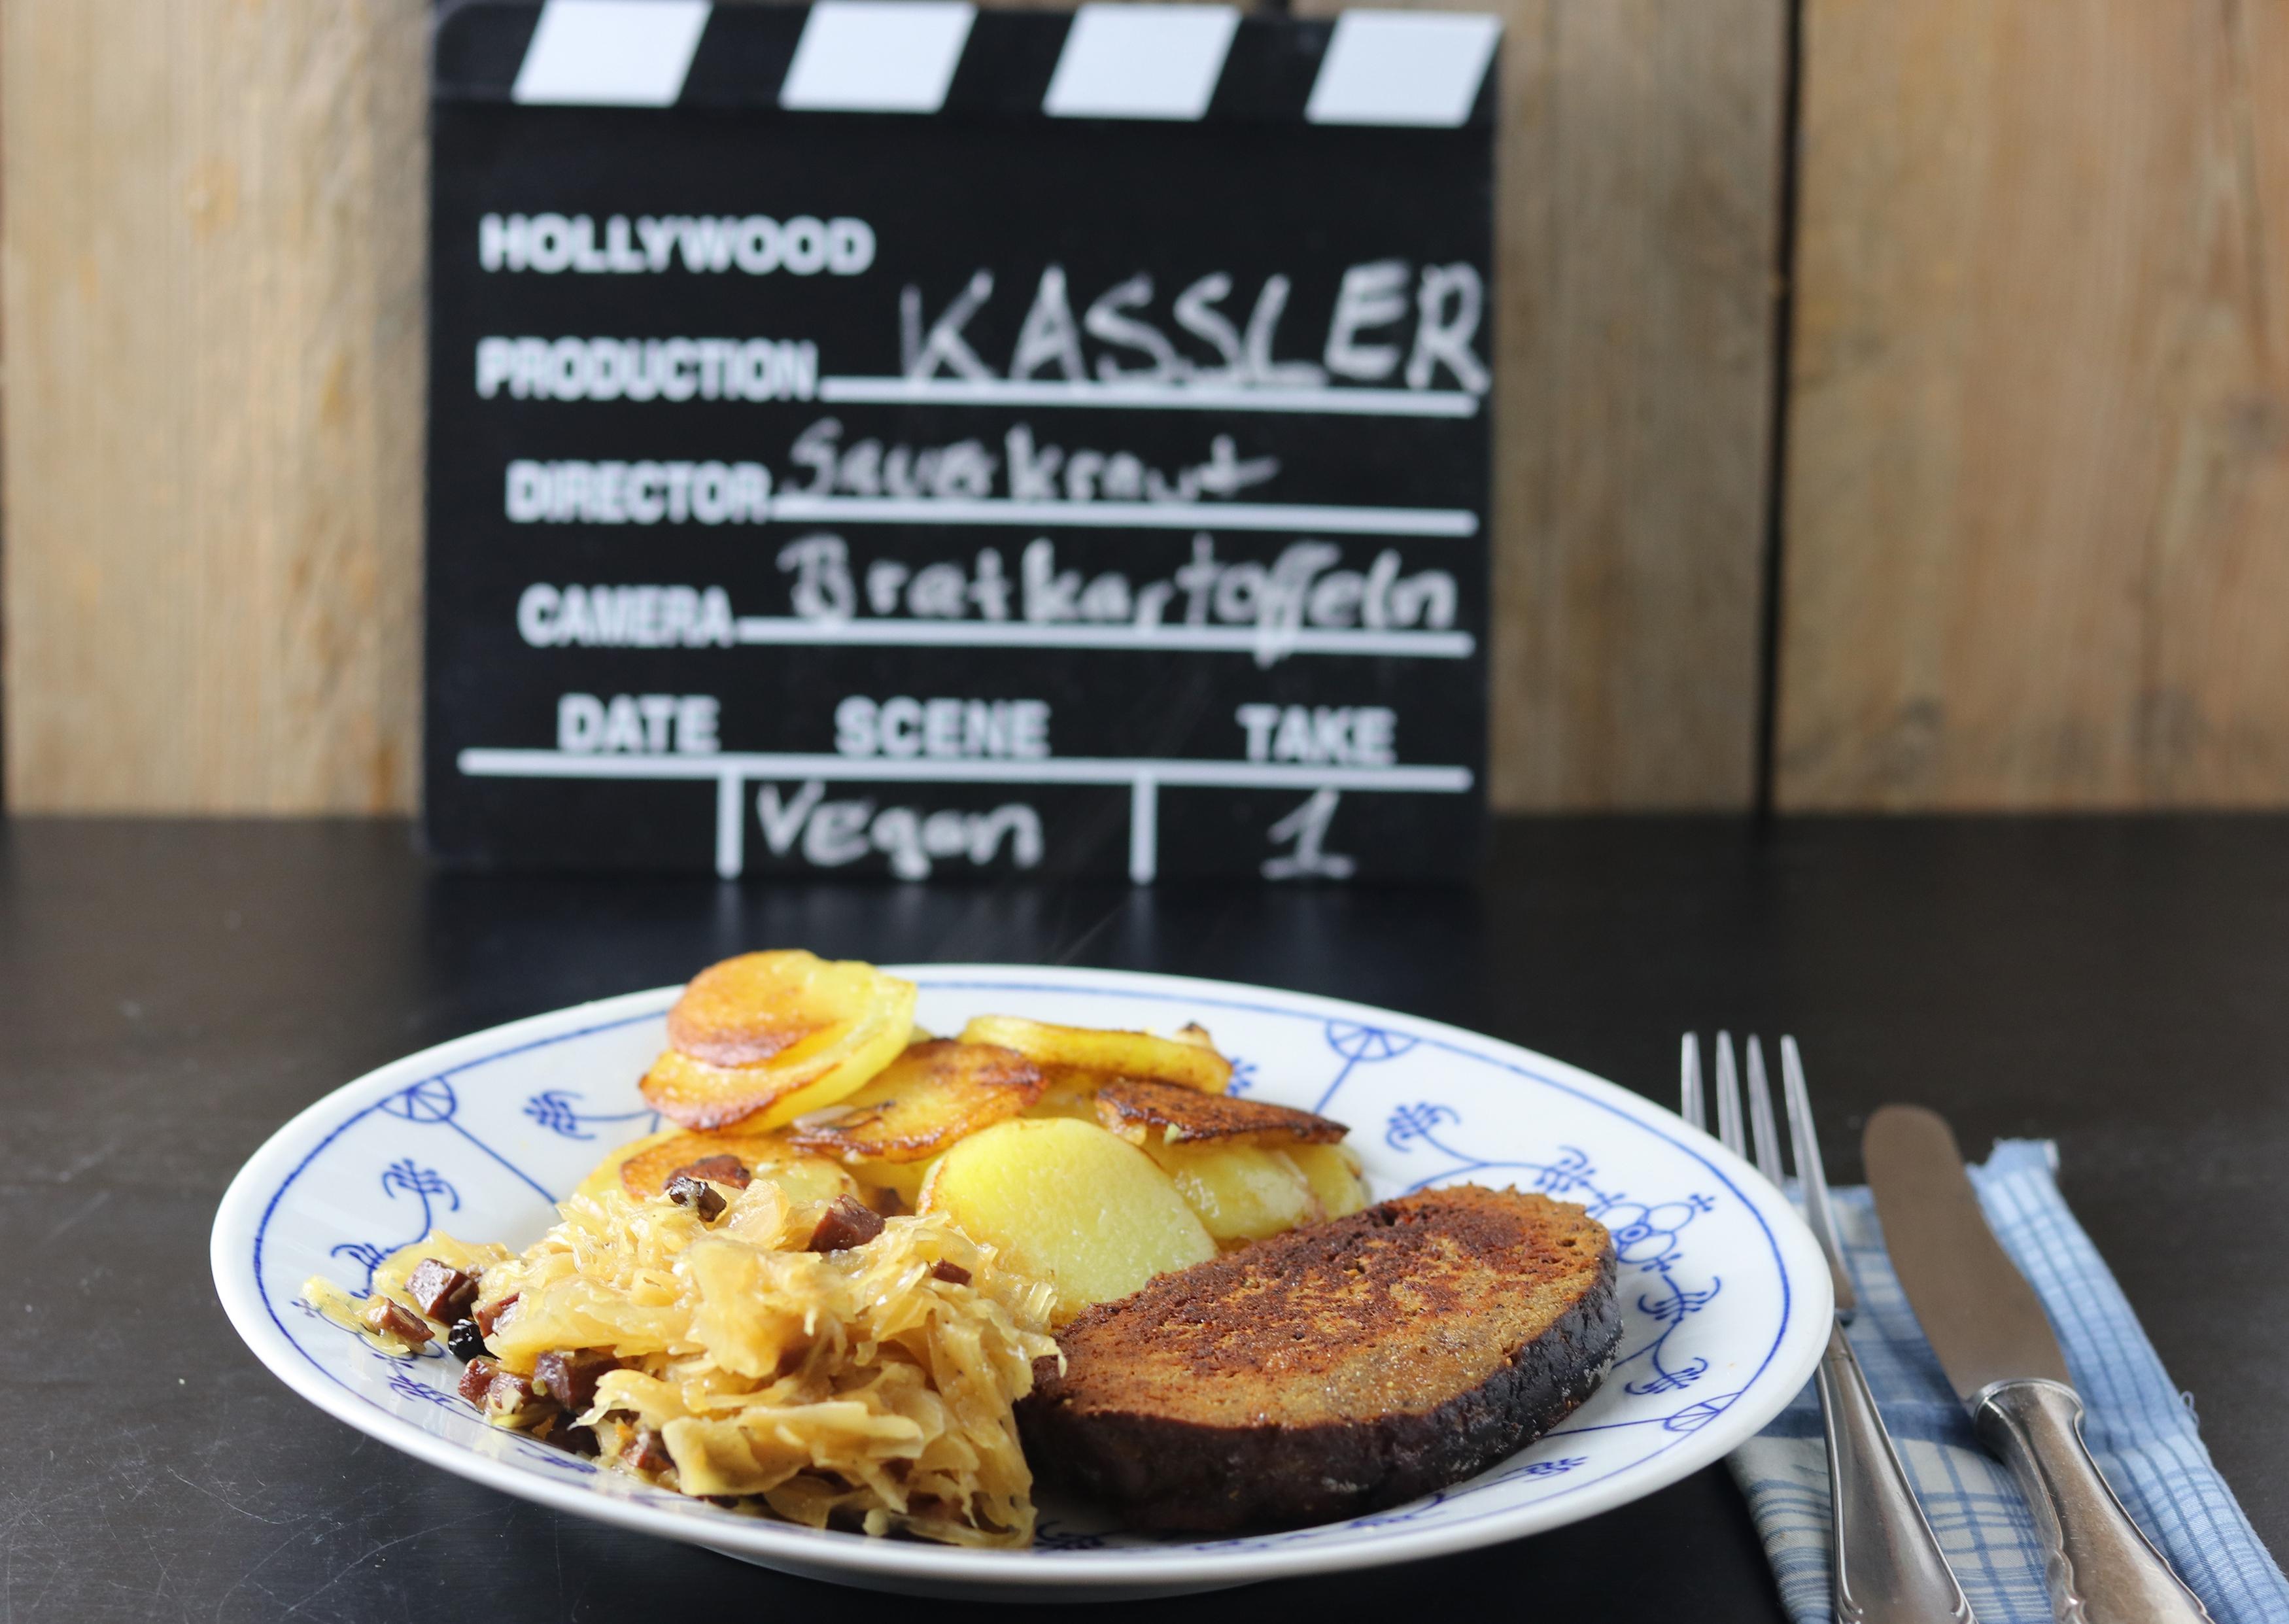 Kassler, Sauerkraut, Bratkartoffeln